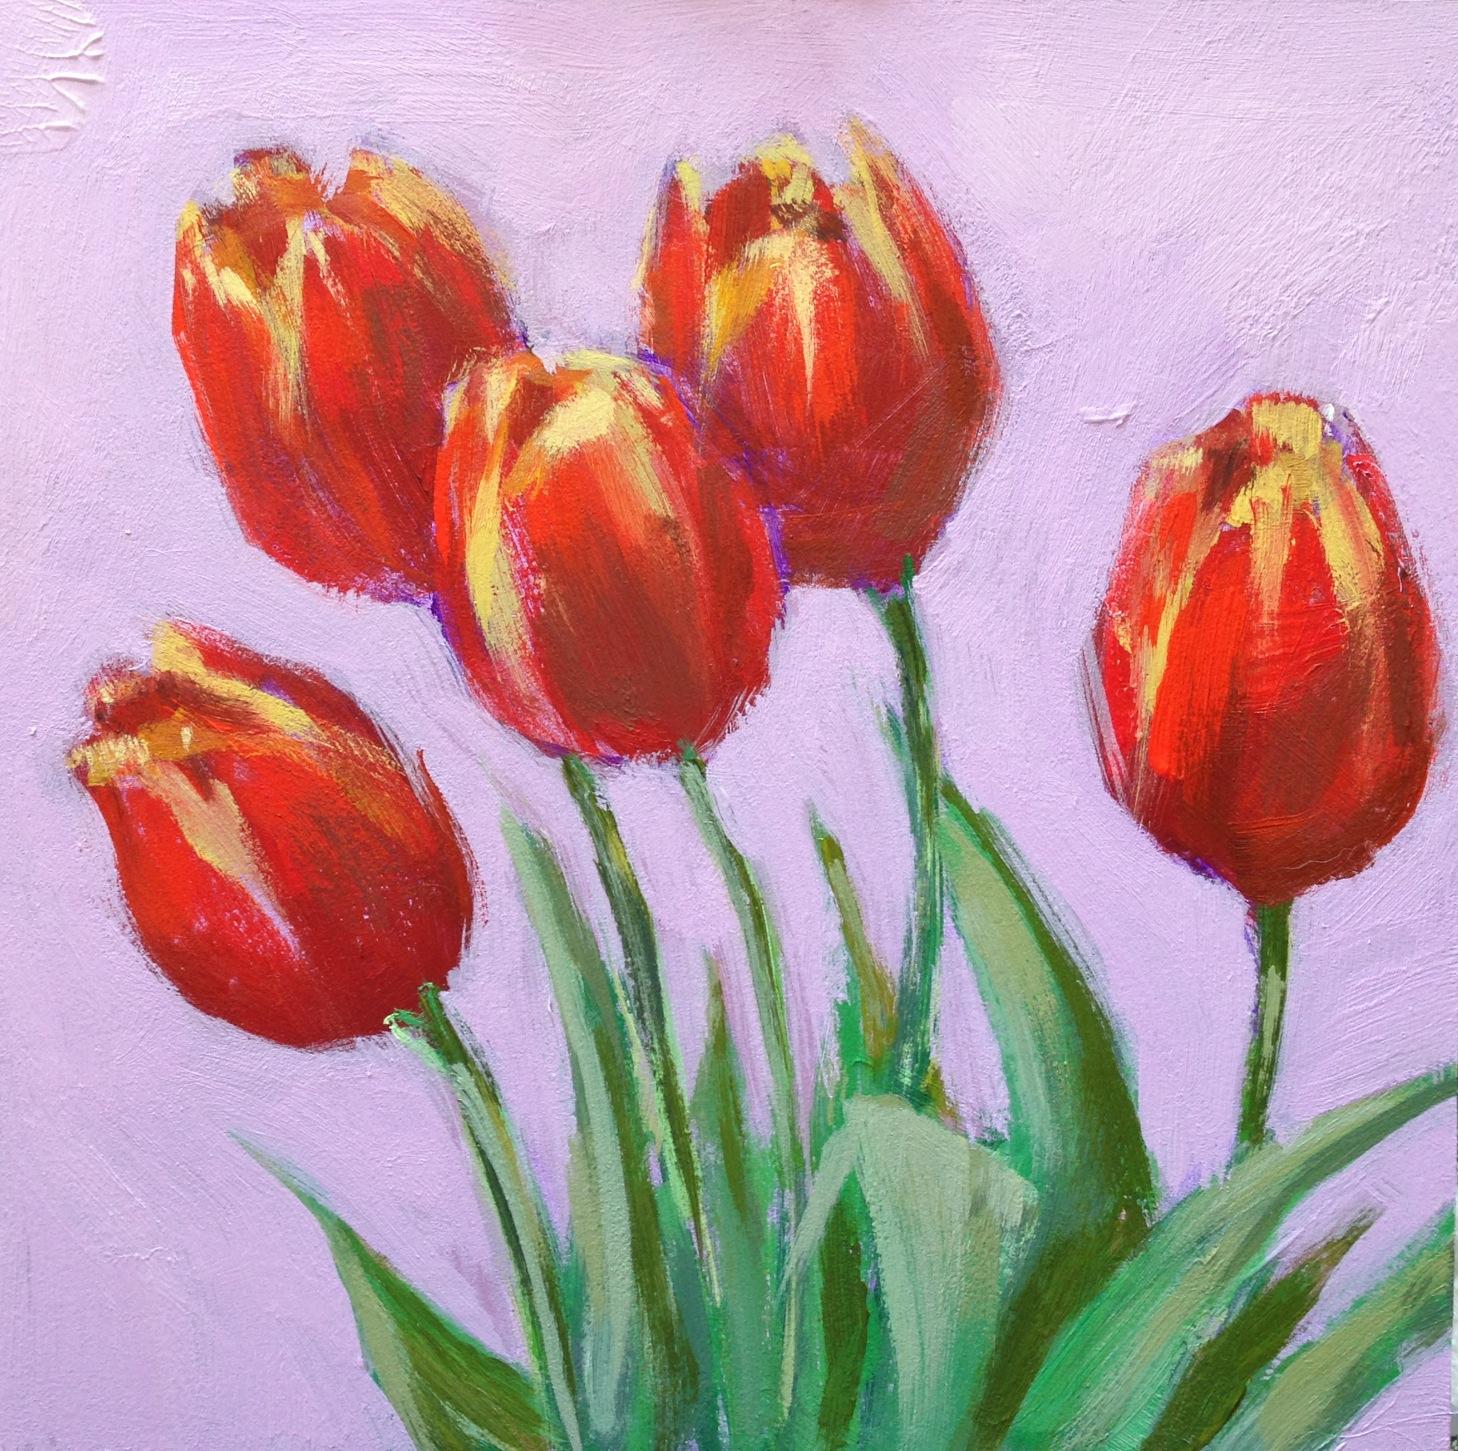 Kelley Macdonald S Paintings Renewal 6x6 Acrylic